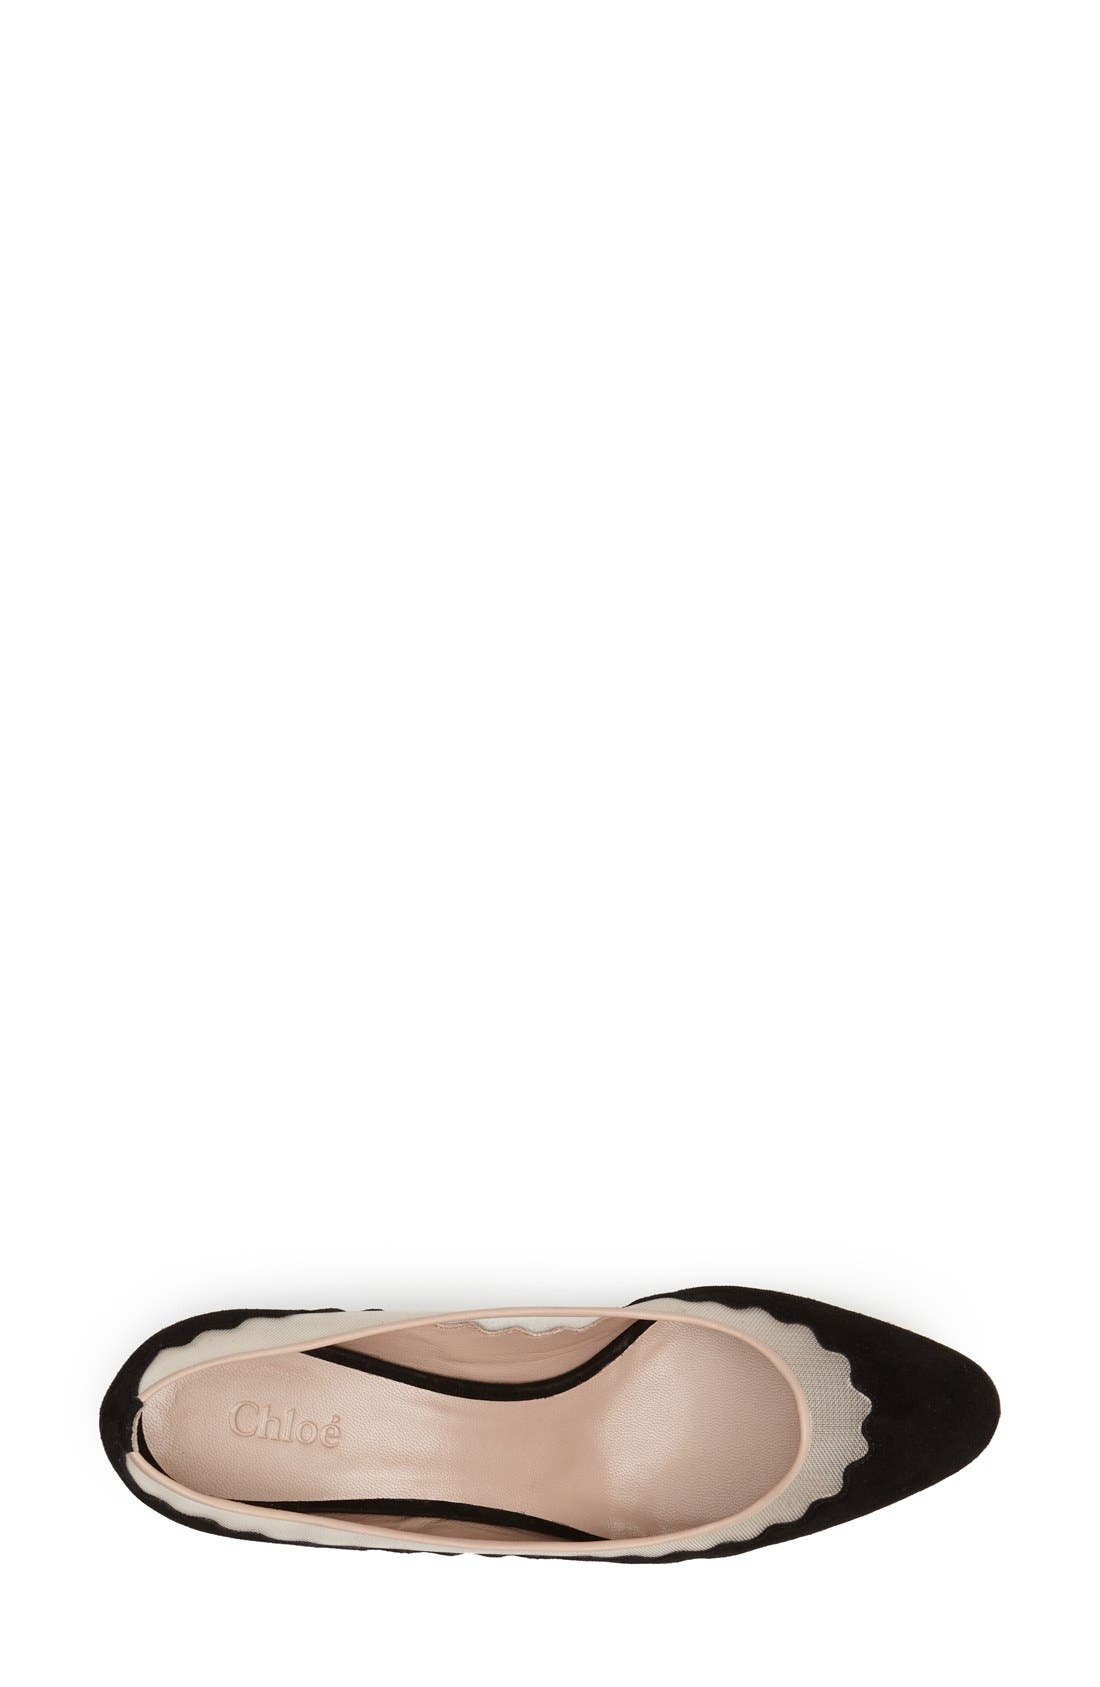 Alternate Image 3  - Chloé 'Bridget' Scalloped Almond Toe Pump (Women)